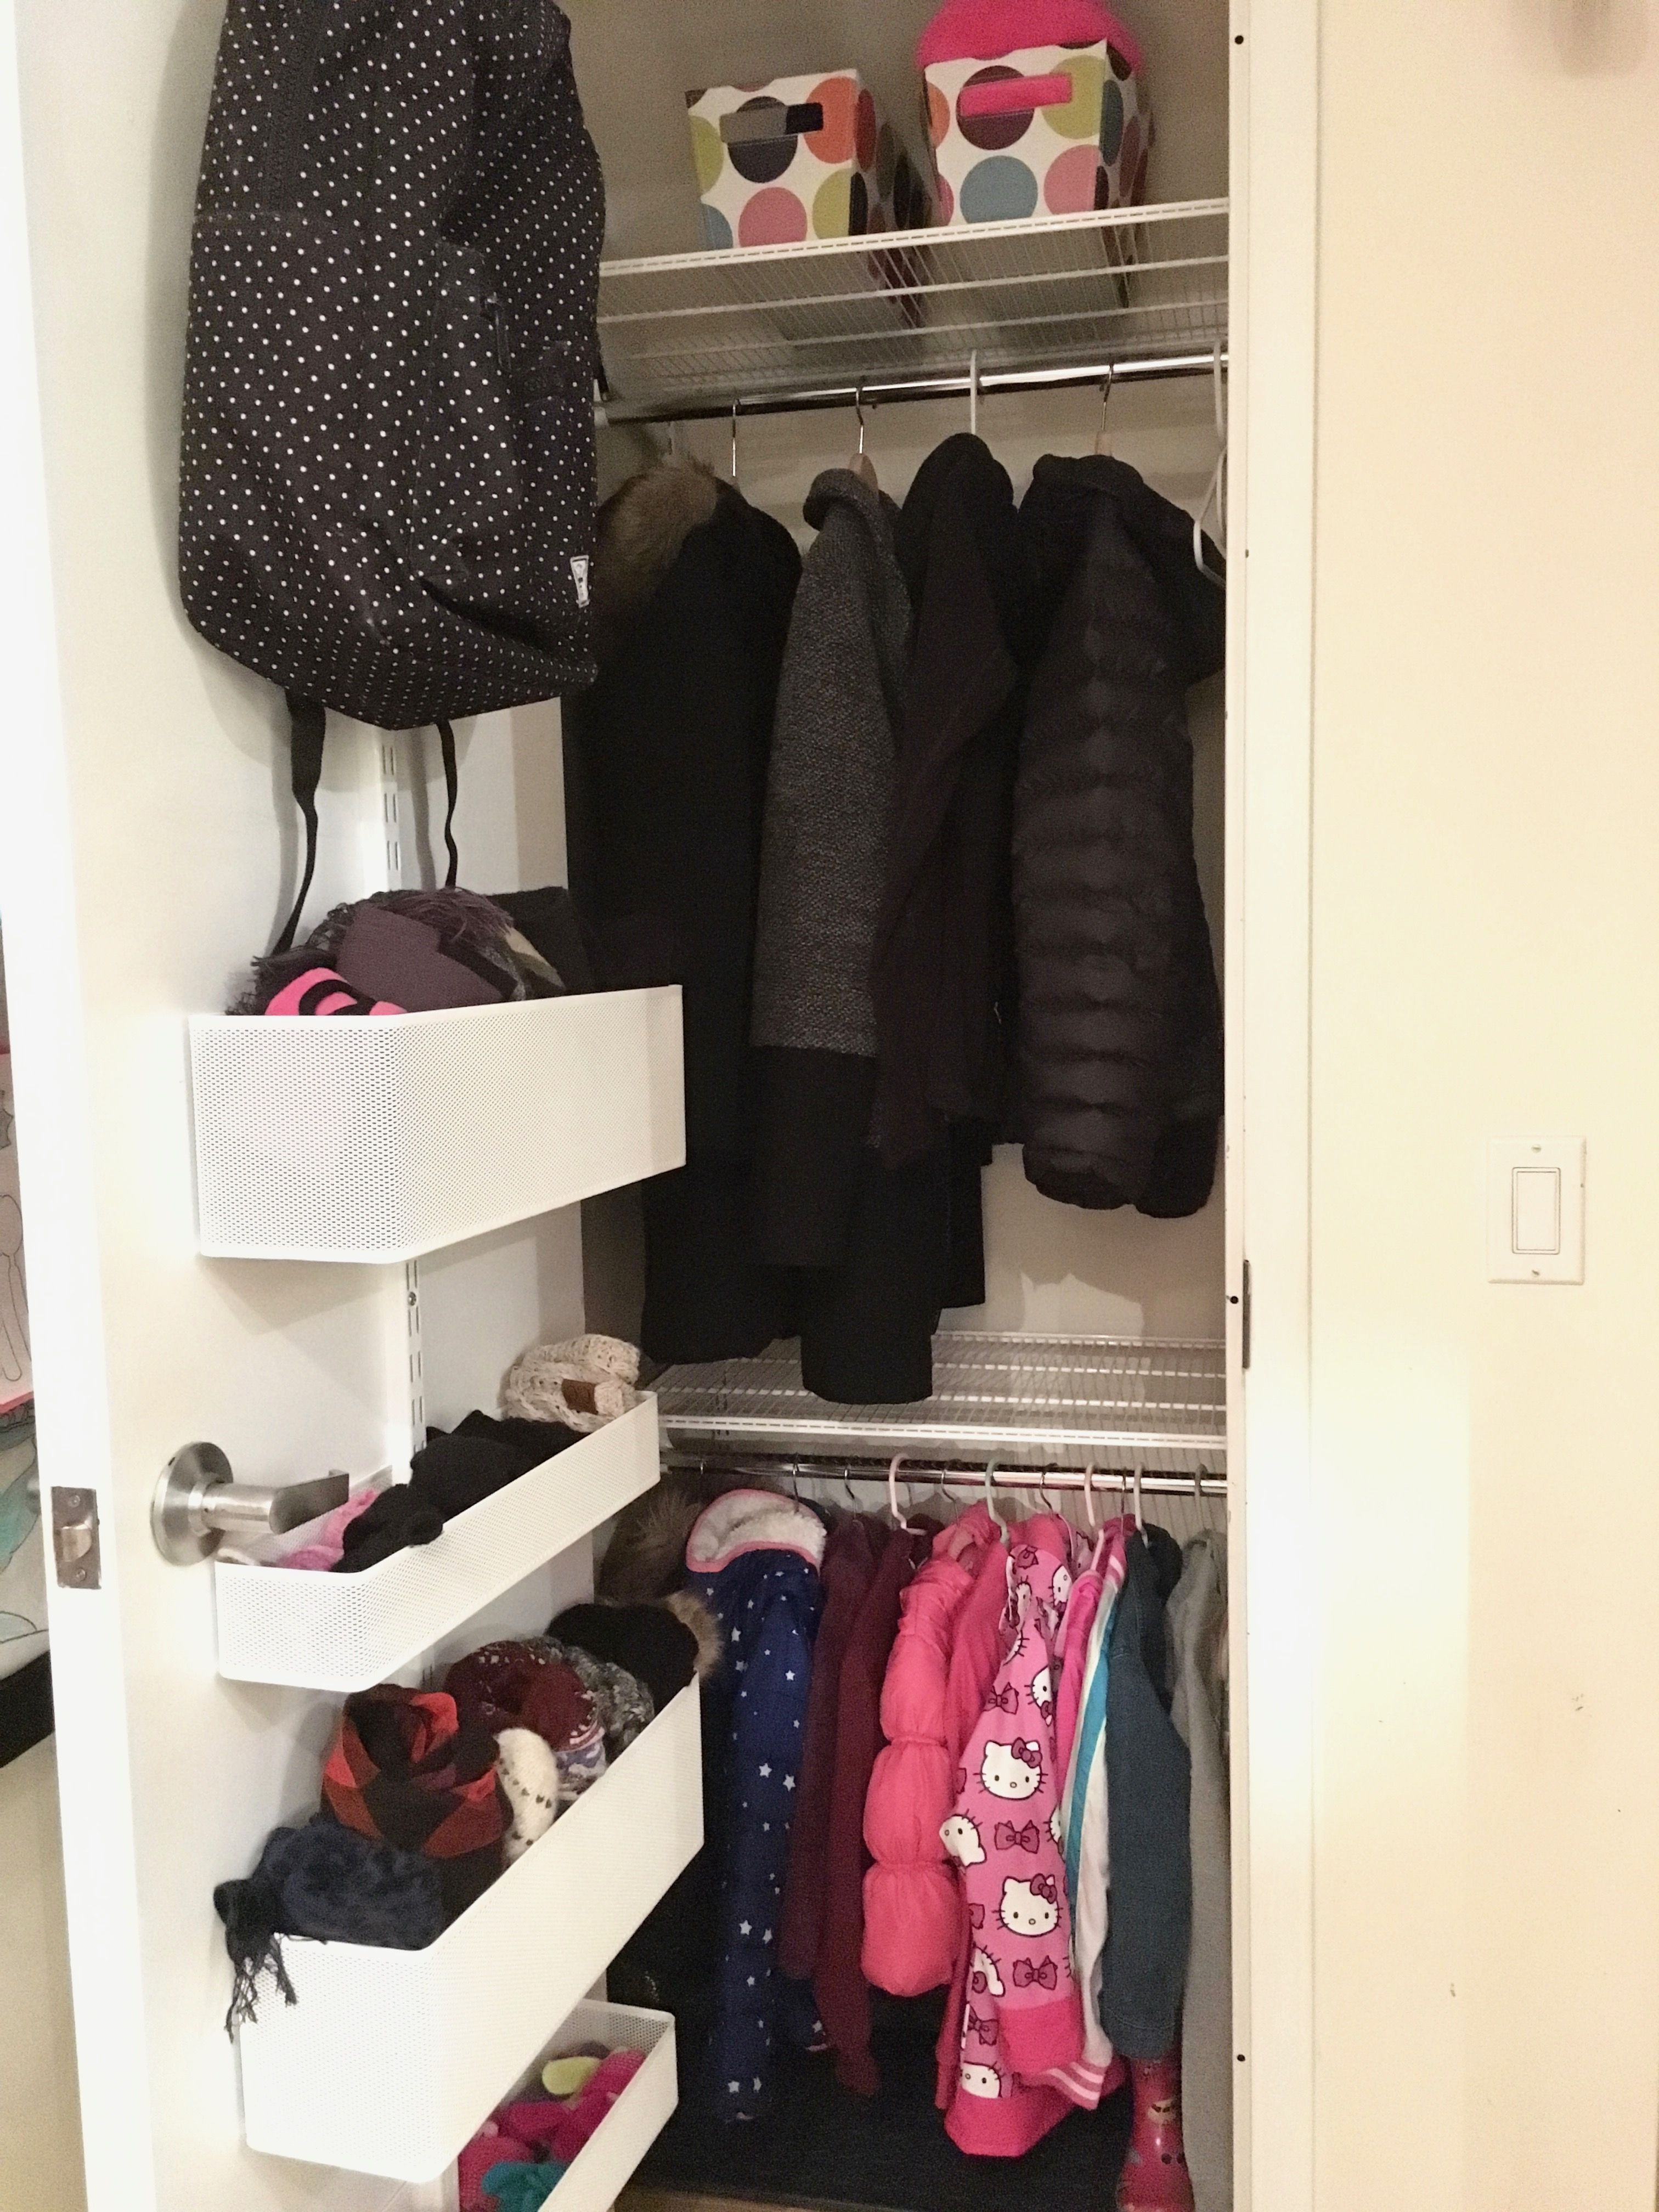 Small Elfa Coat Closet By Professional Organizer Laura Cattano